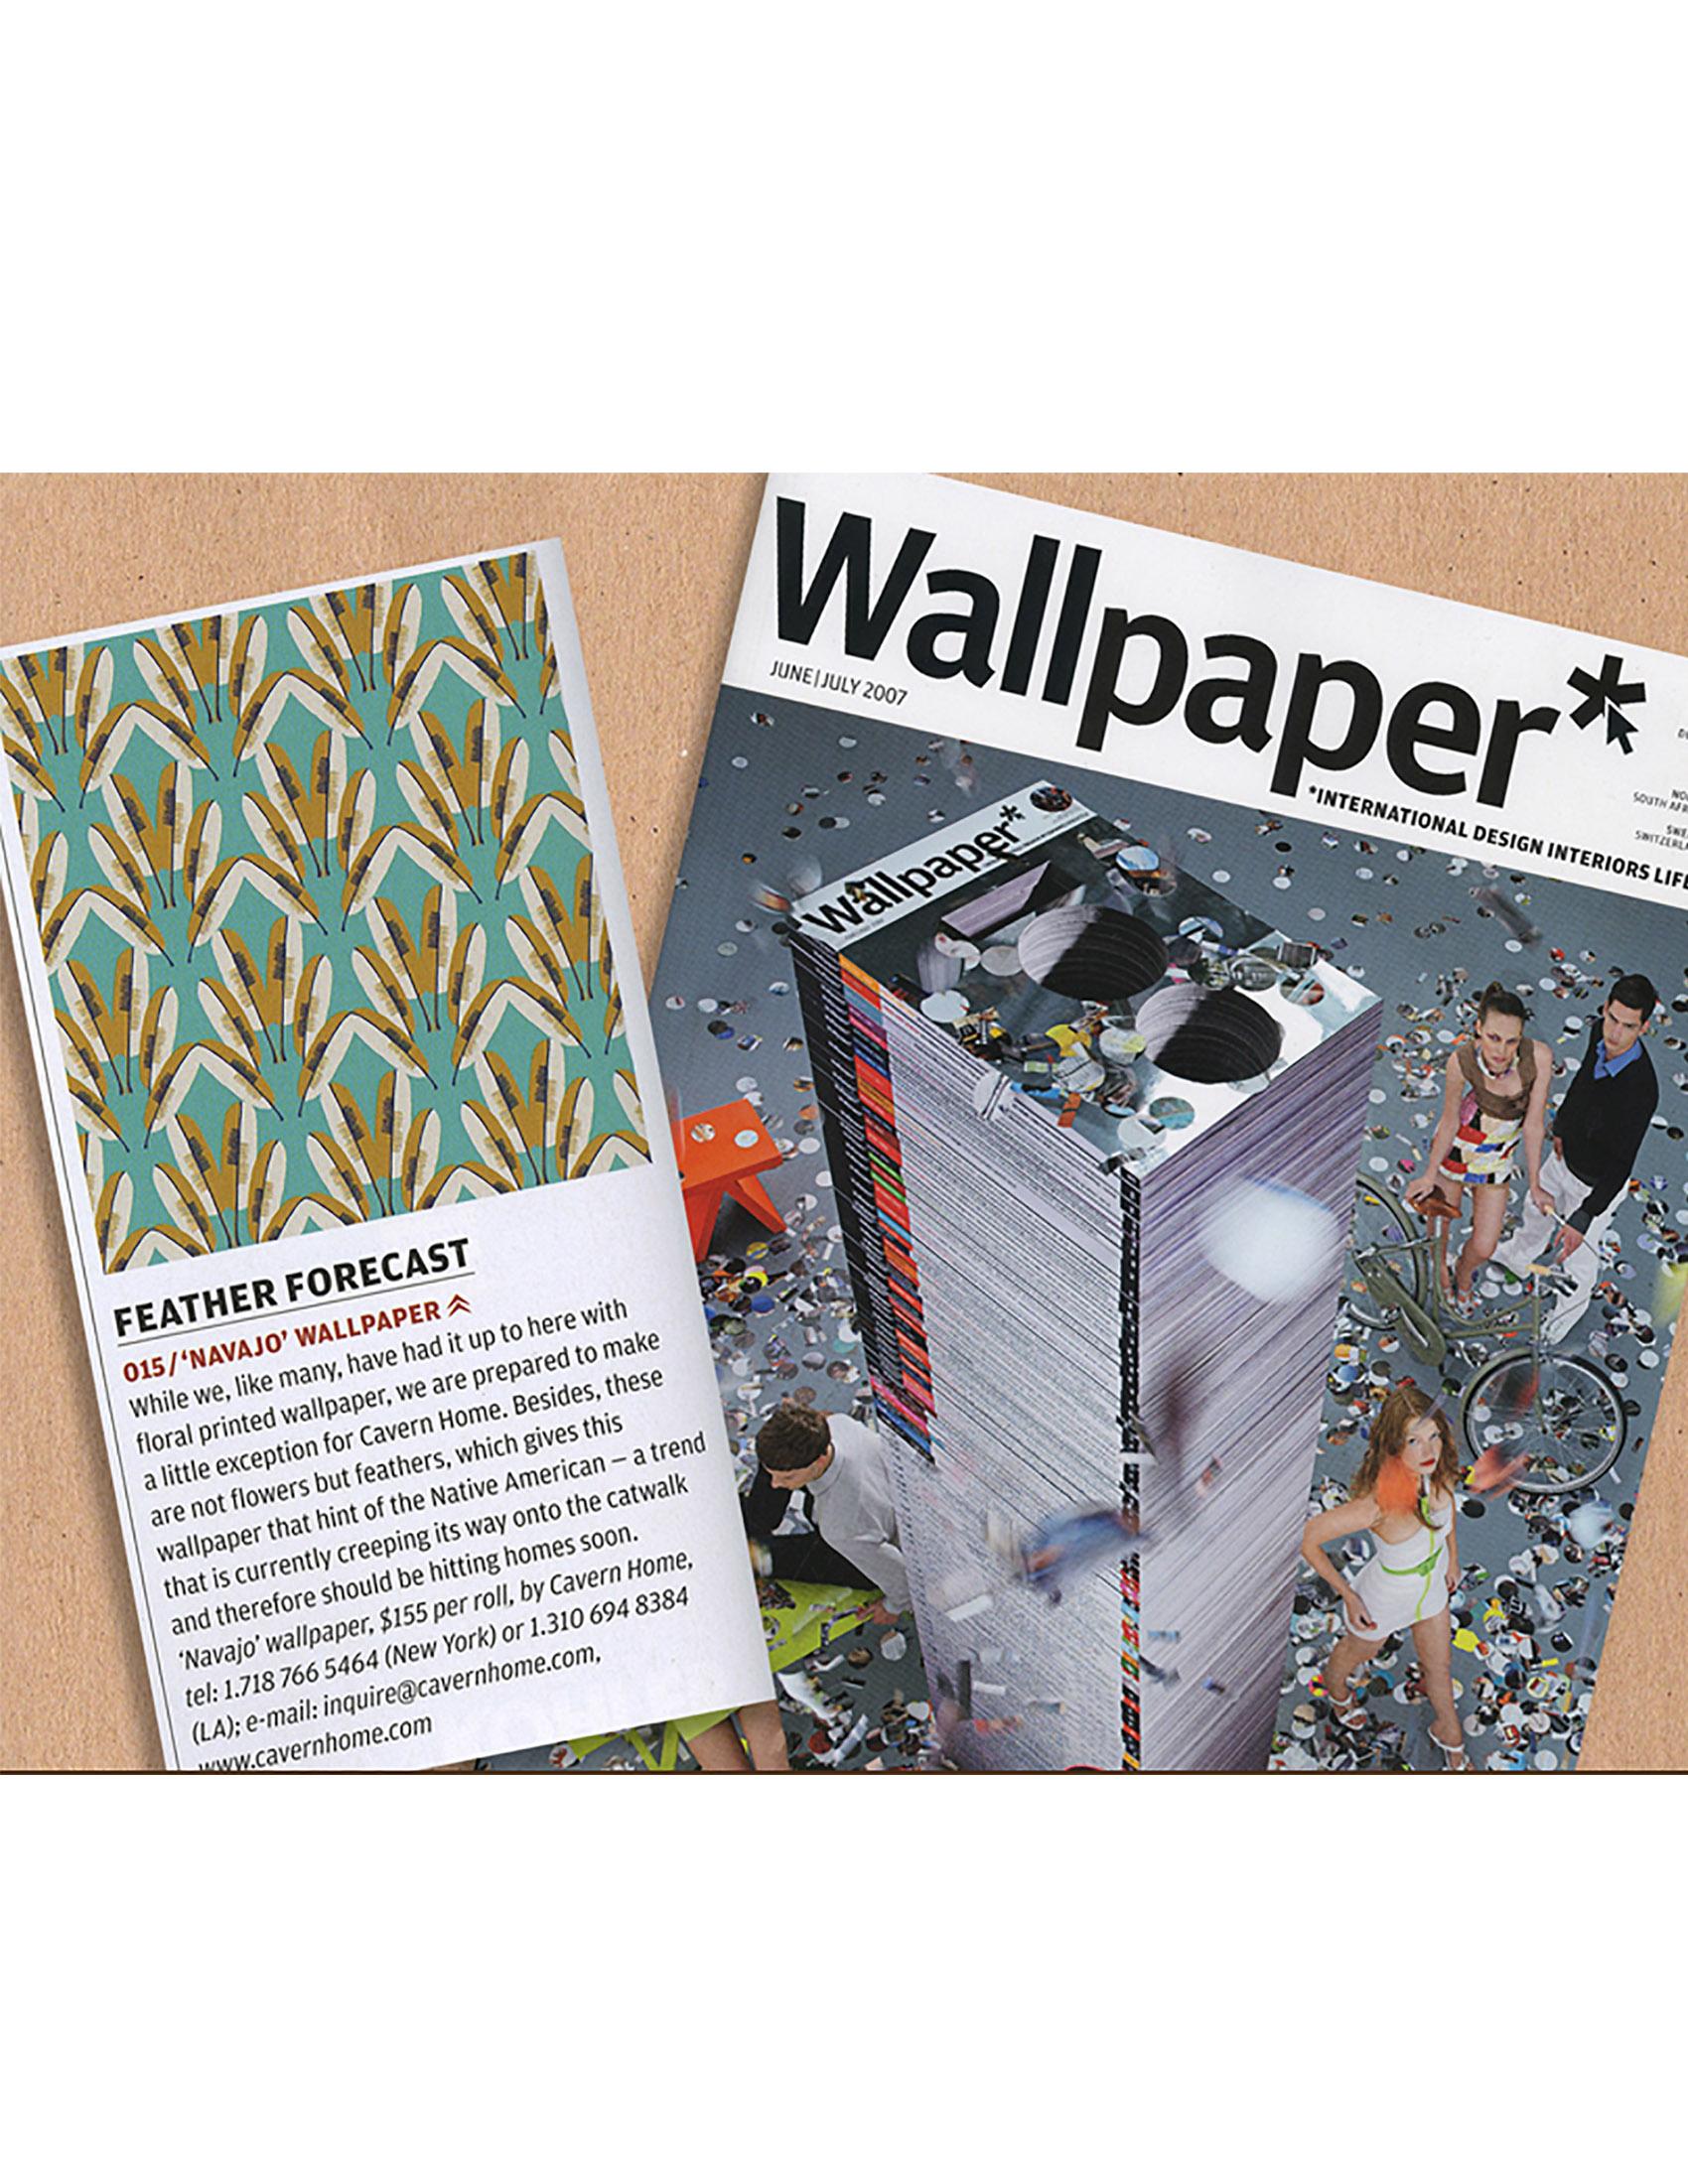 Wallpaper Magazine June/July 2007